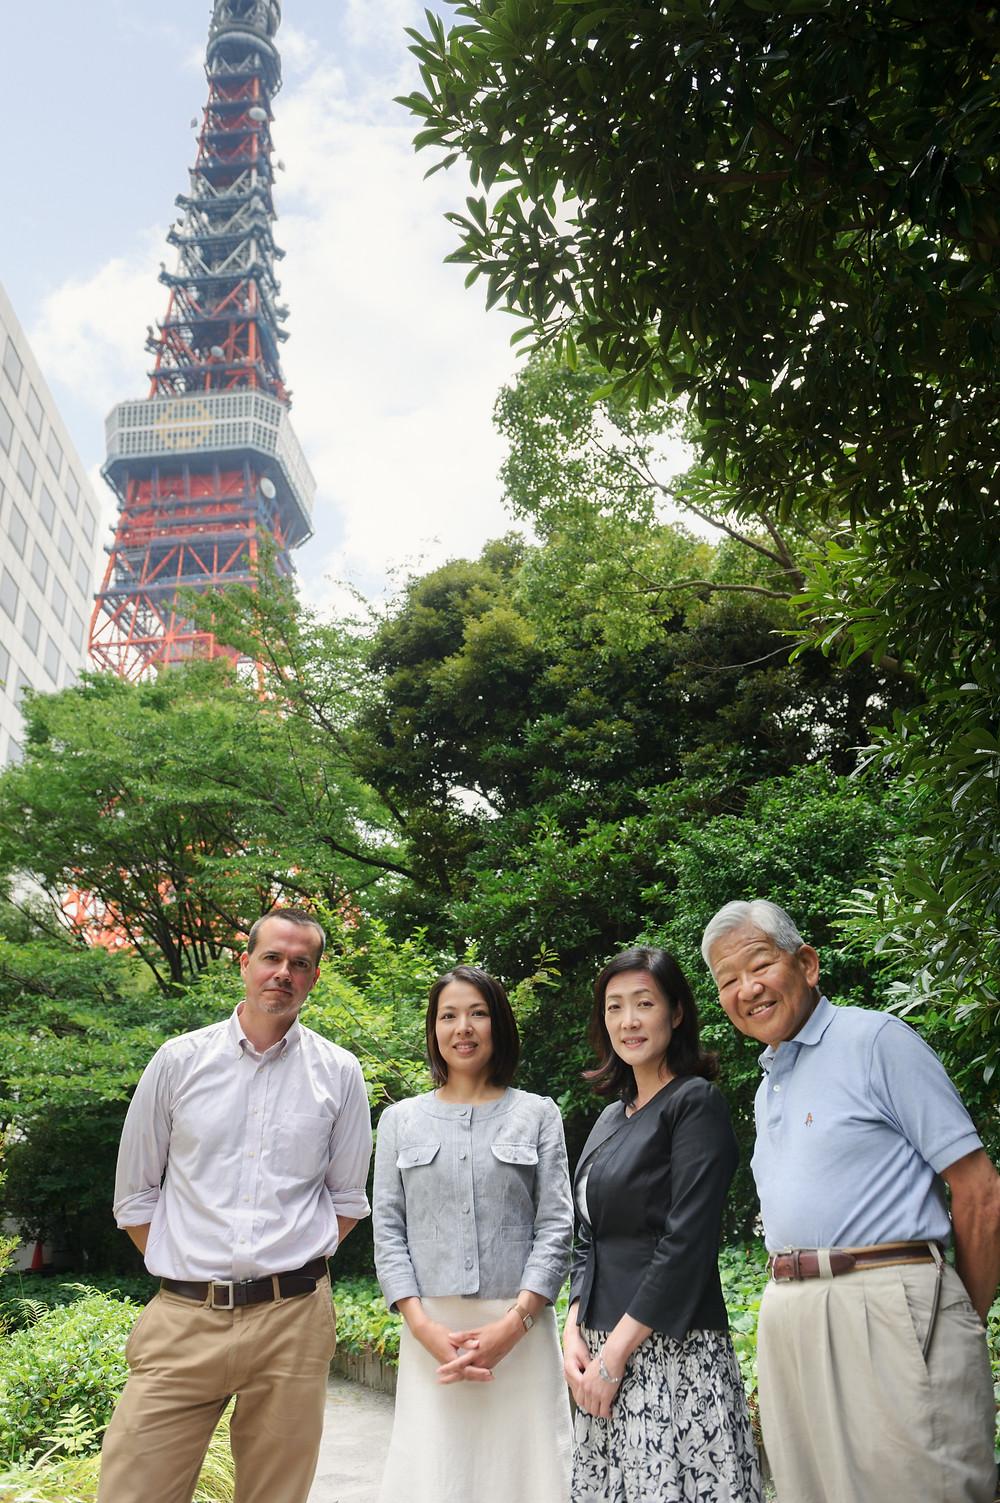 From left: Jason Chare, Shihoka Fujiwara, Emiko Tokunaga, and Paul Fukuda